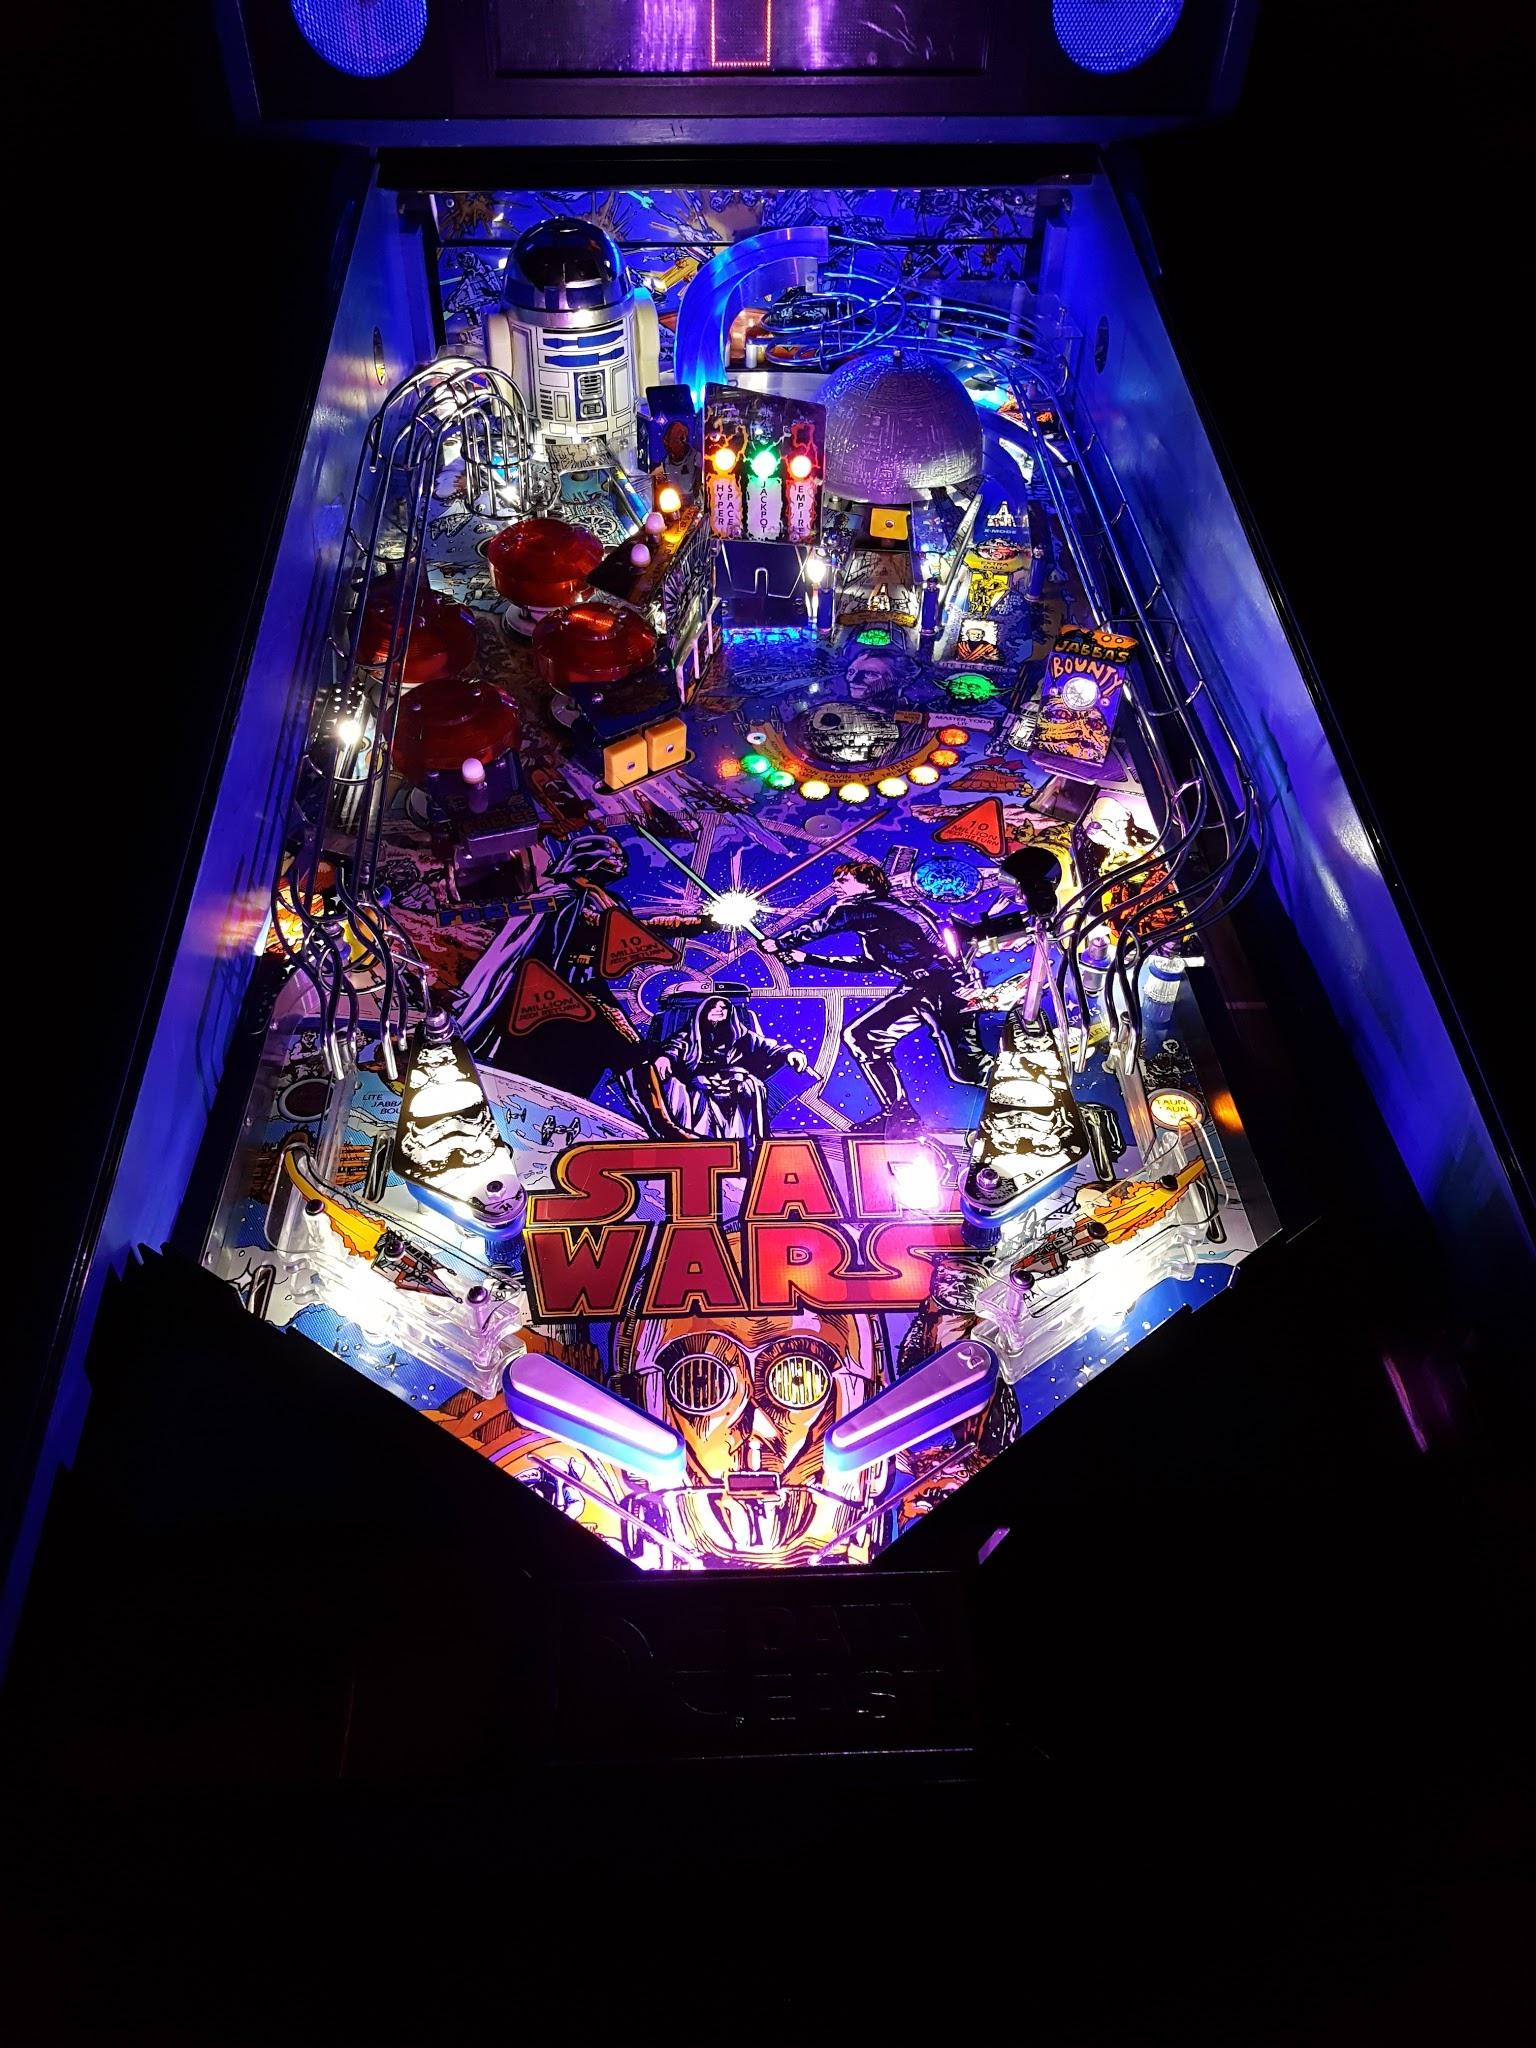 247 spins casino